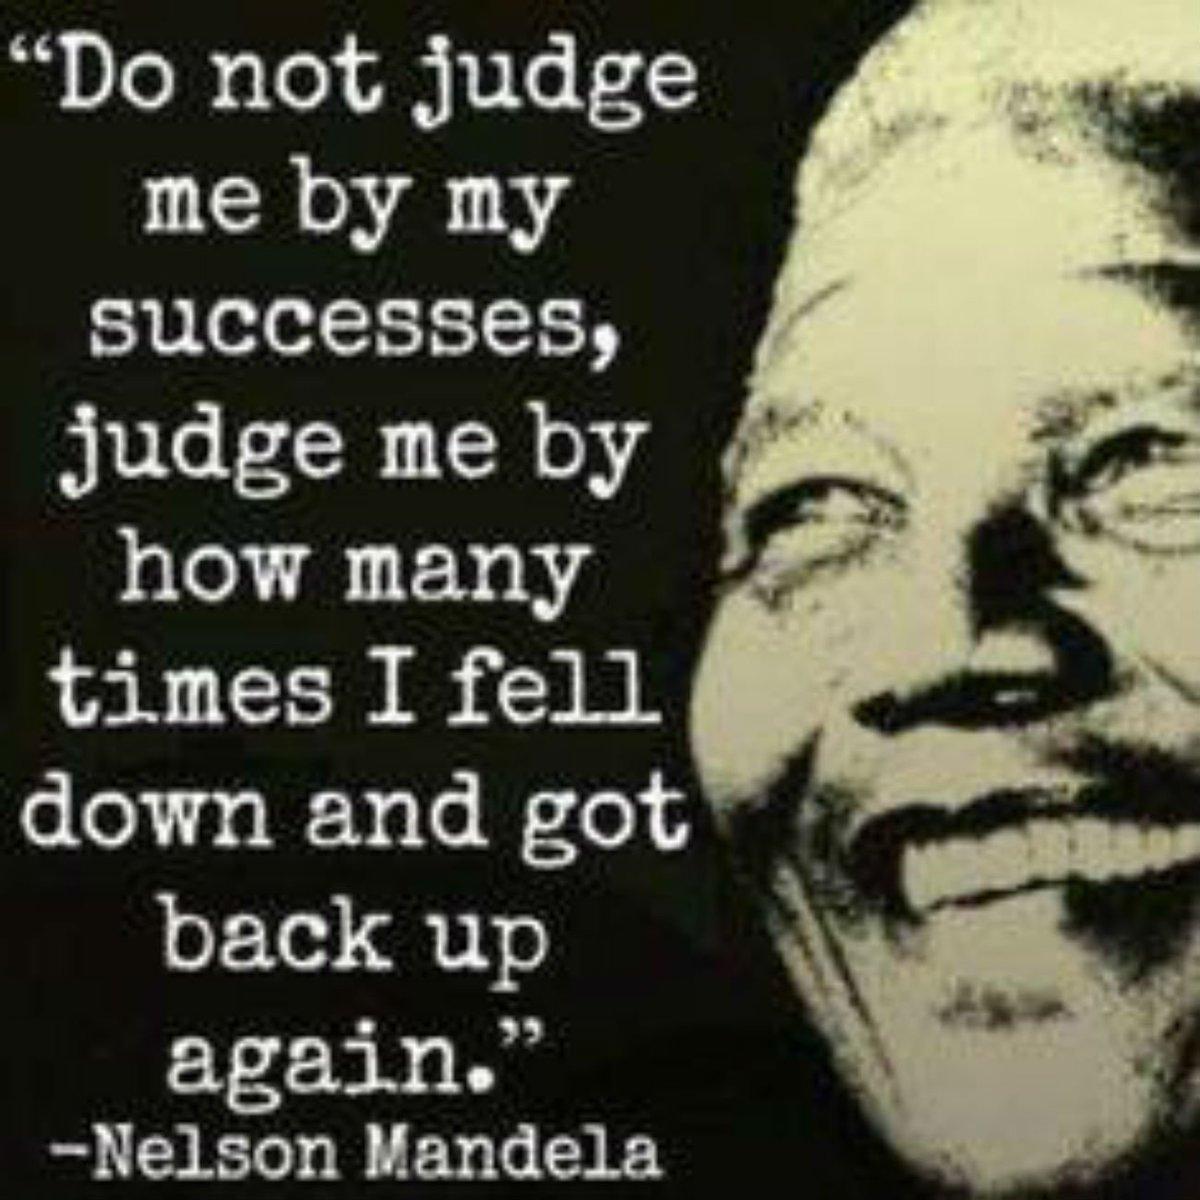 Do Not Judge Me By My Successes   http:// dld.bz/e5qDR  &nbsp;    #saying #quote #qotd #nelsonmandela<br>http://pic.twitter.com/QrLfv0O6Hl